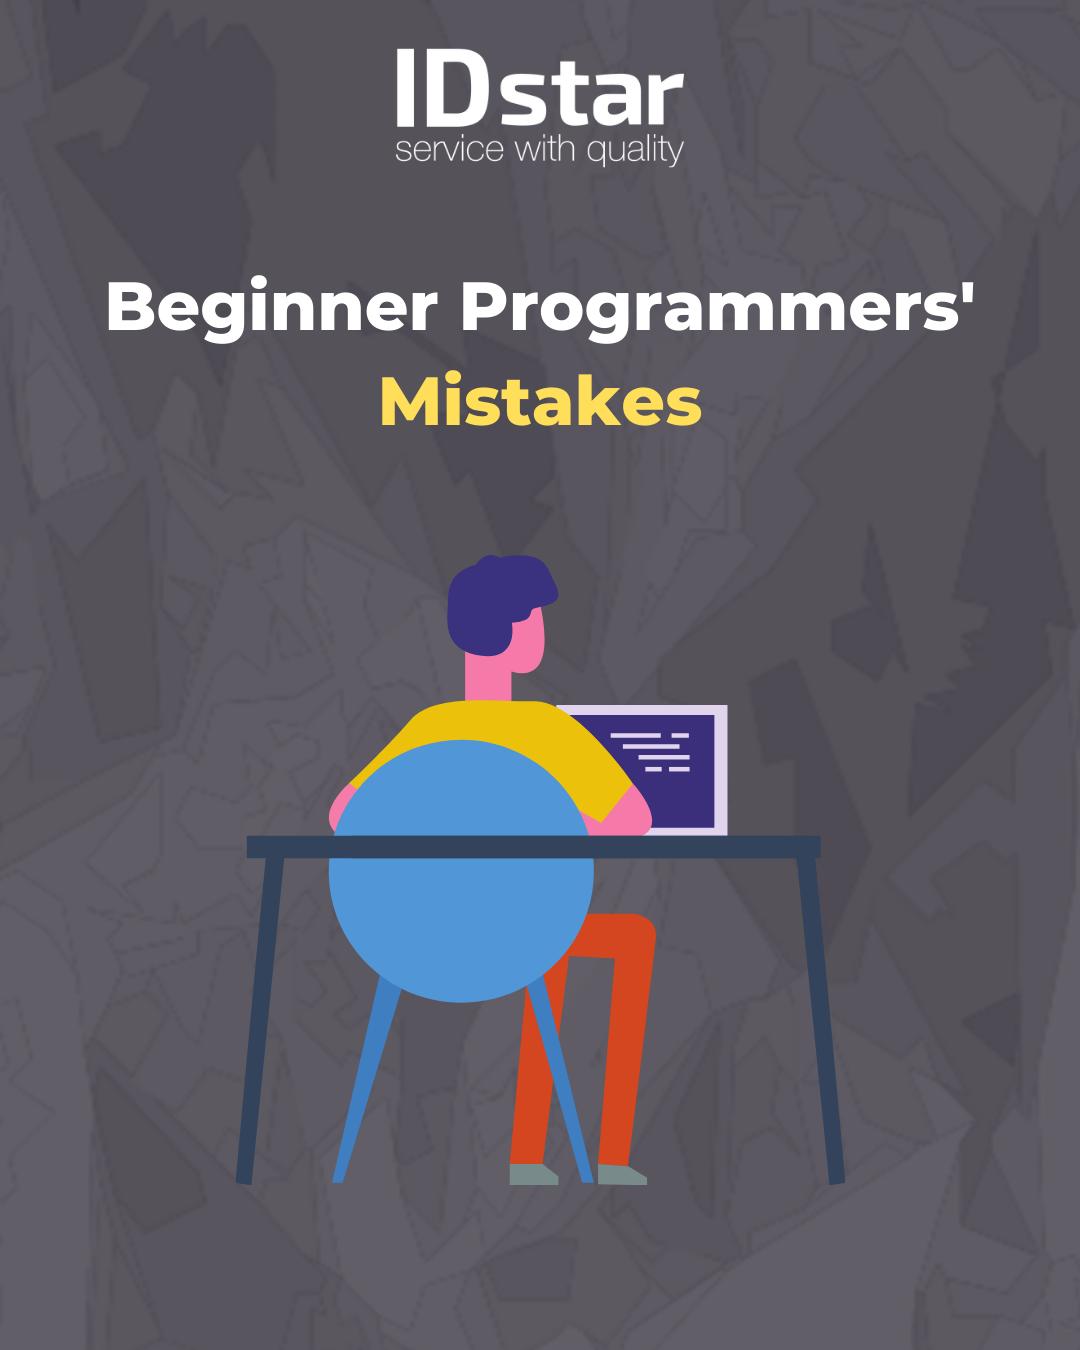 Beginner Programmers' Mistakes